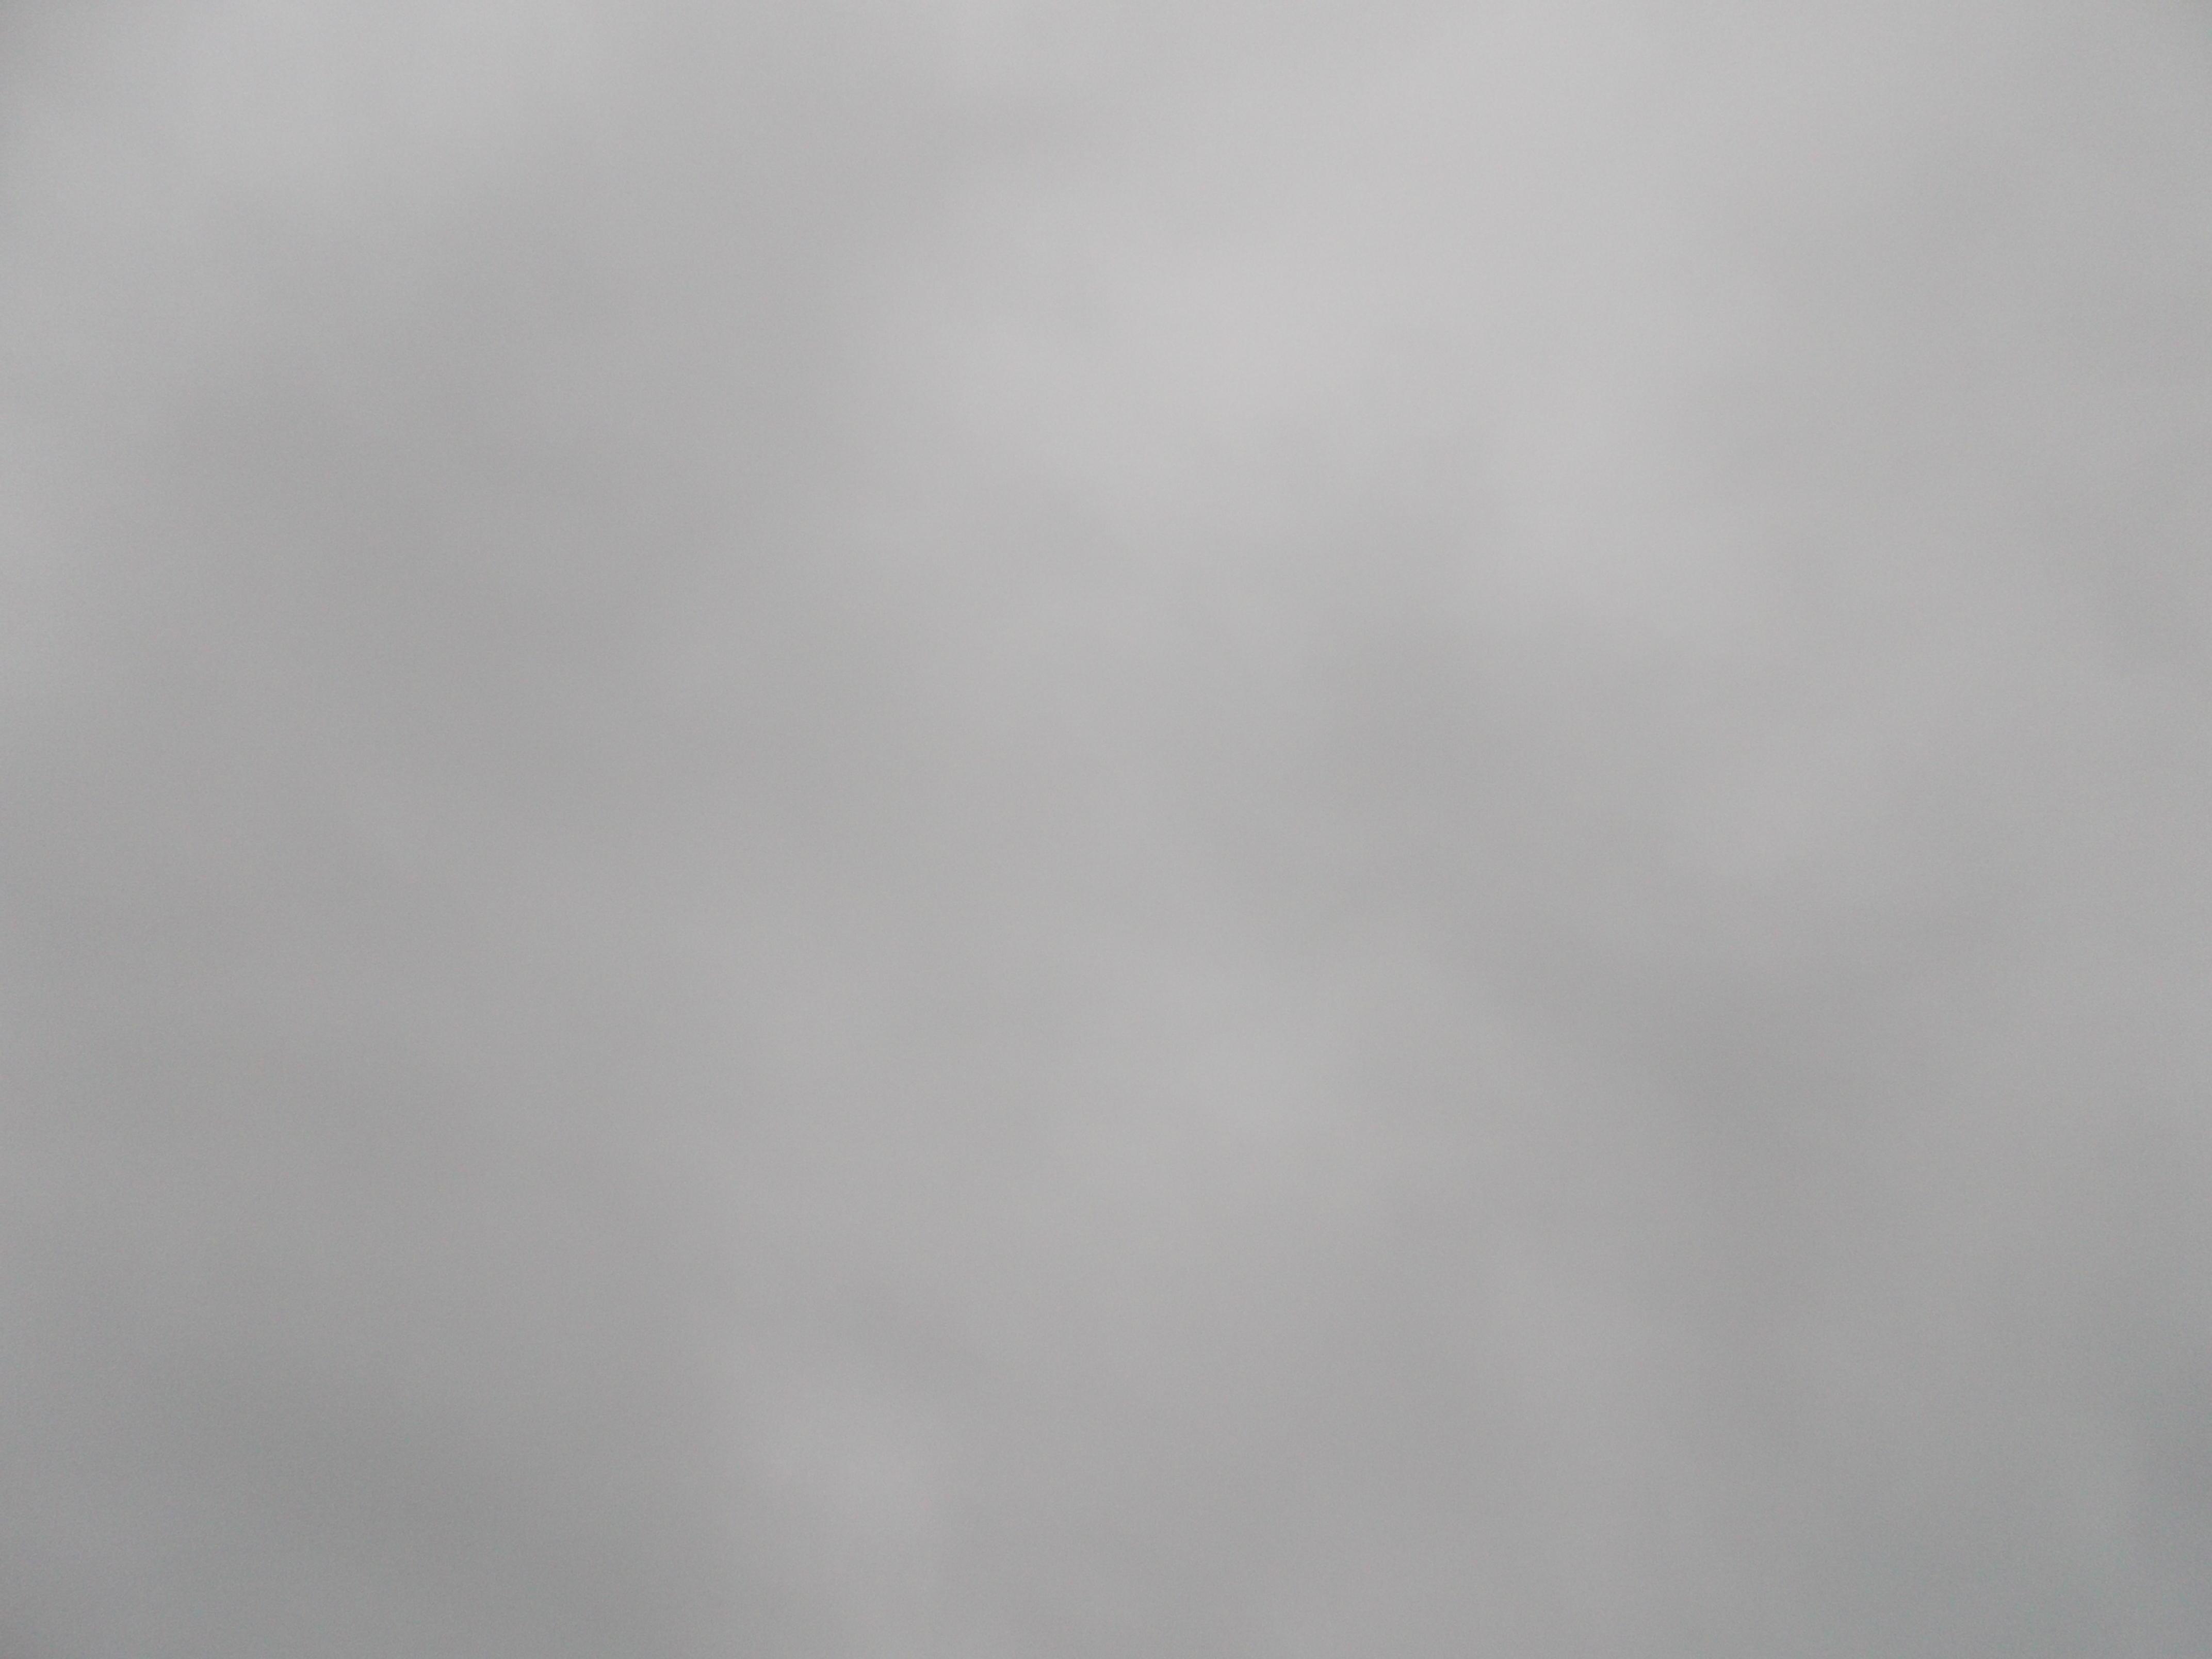 2013-01-04 Longitude -0.371 Latitude 49.182 Altitude 13 Heure 13h33